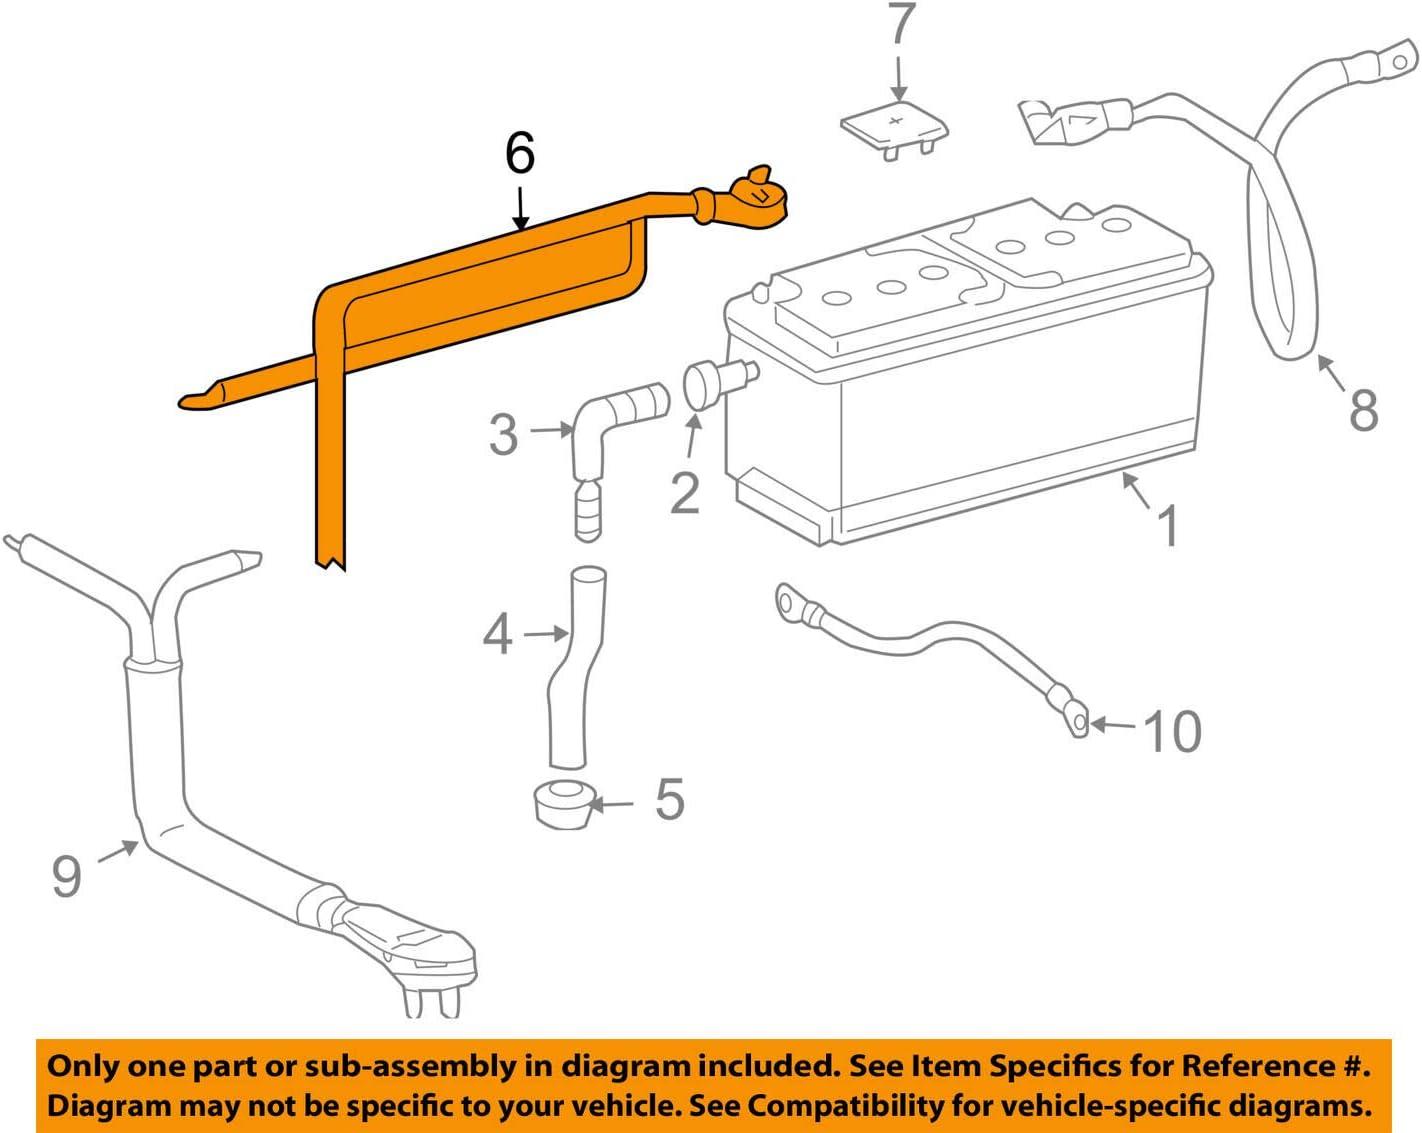 Mercedes OEM 04-09 Luxury goods SL600 Rare Cable 5.5L-V12 2305407 Battery-Positive